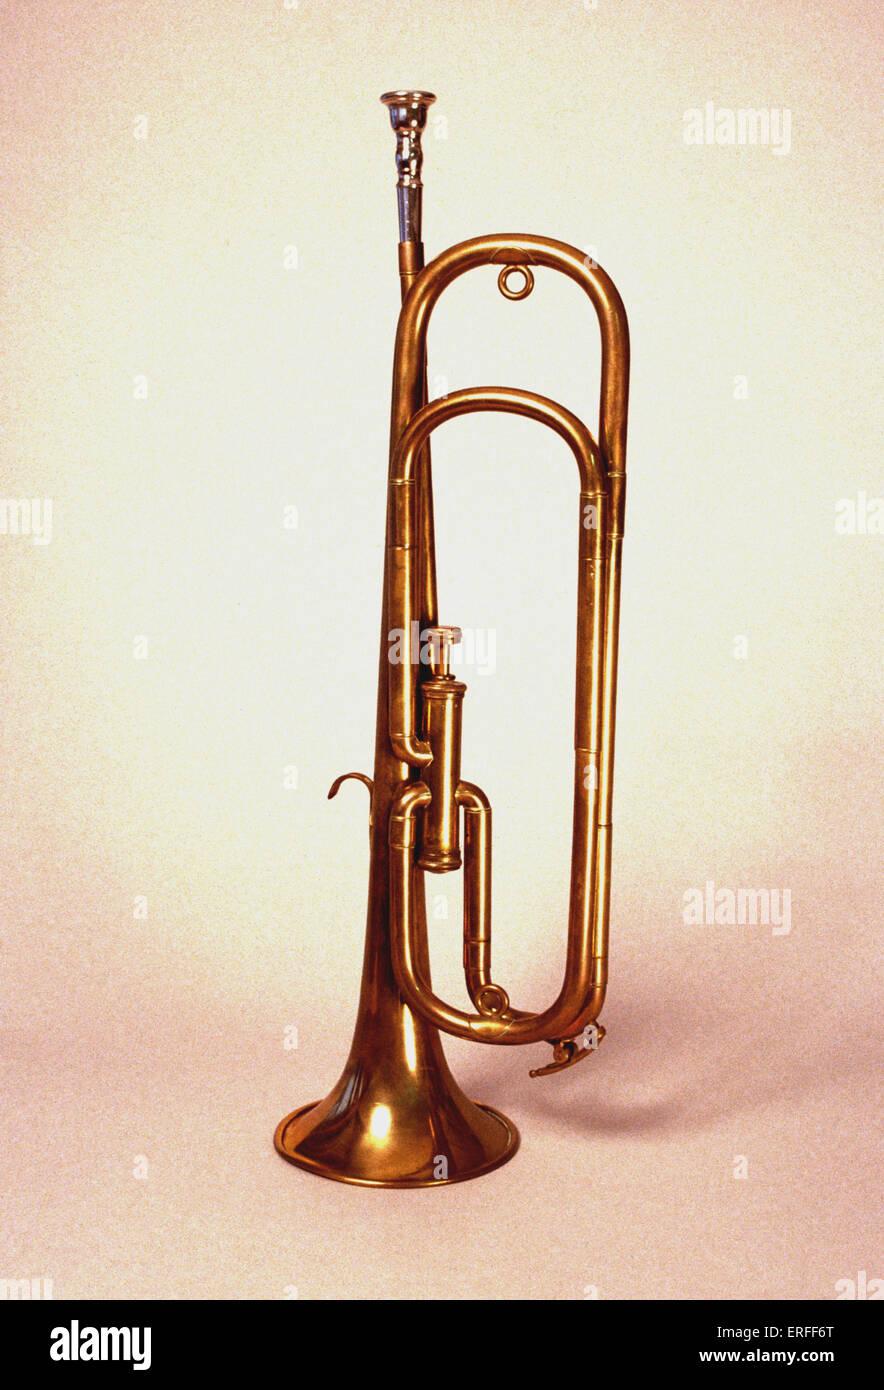 Cavalry trumpet - Stock Image